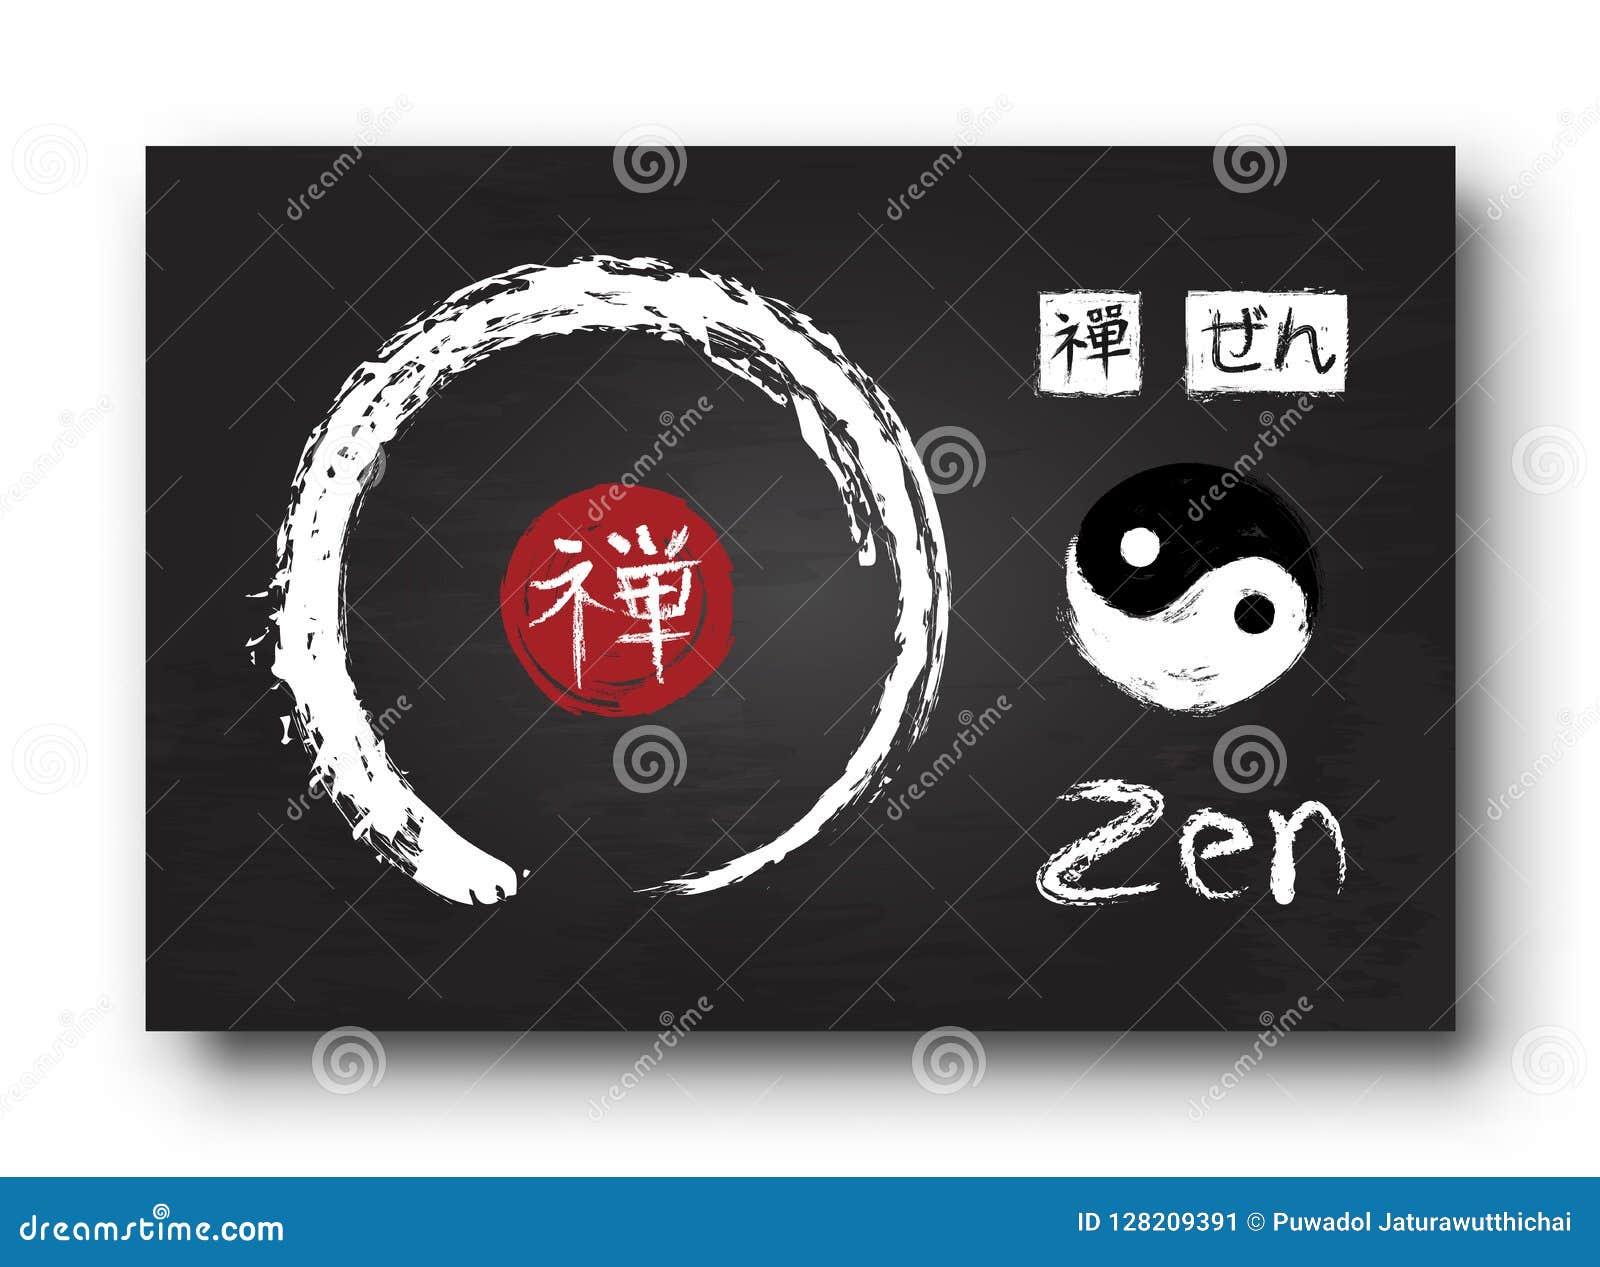 Enso Zen Circle With Kanji Calligraphy Chinese Japanese Alphabet